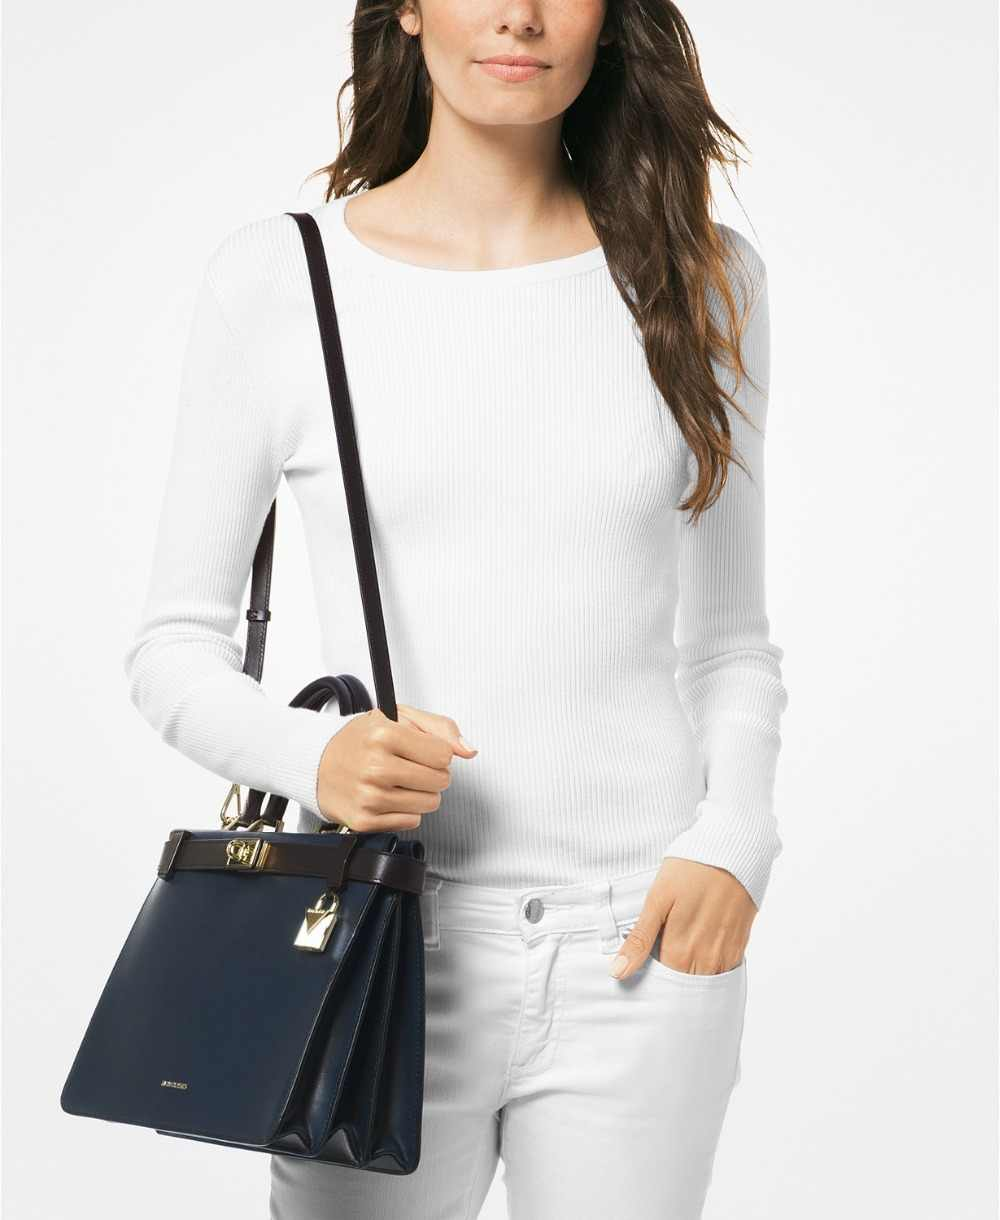 4c4e0f1879c5 ... Michael Kors Tatiana Medium Leather Satchel Luxury Handbags For Women  Bags Designer by MK ...